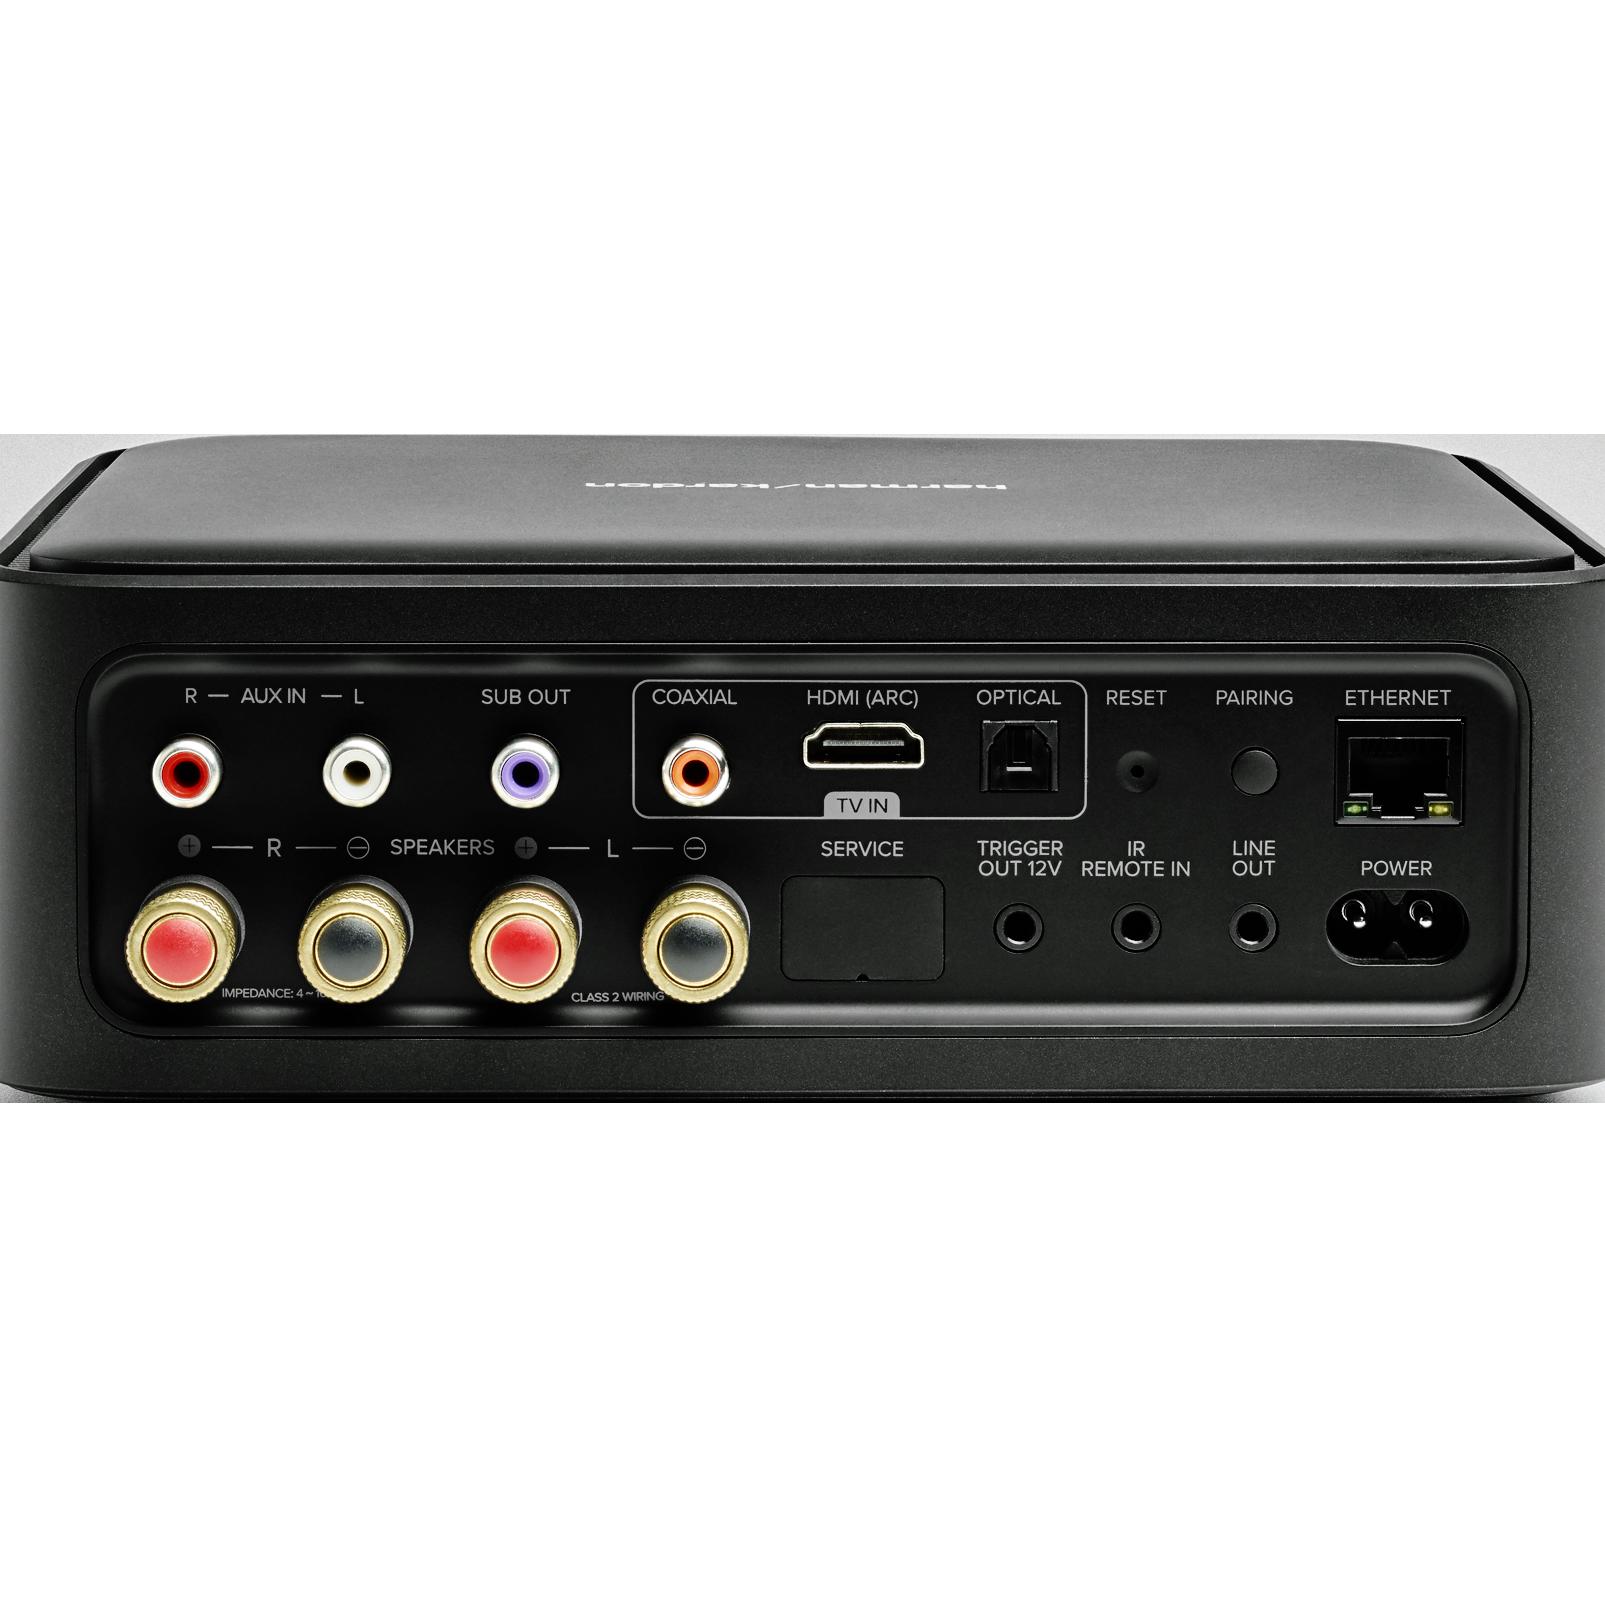 Harman Kardon Citation Amp - Black - High-power, wireless streaming stereo amplifier - Detailshot 2